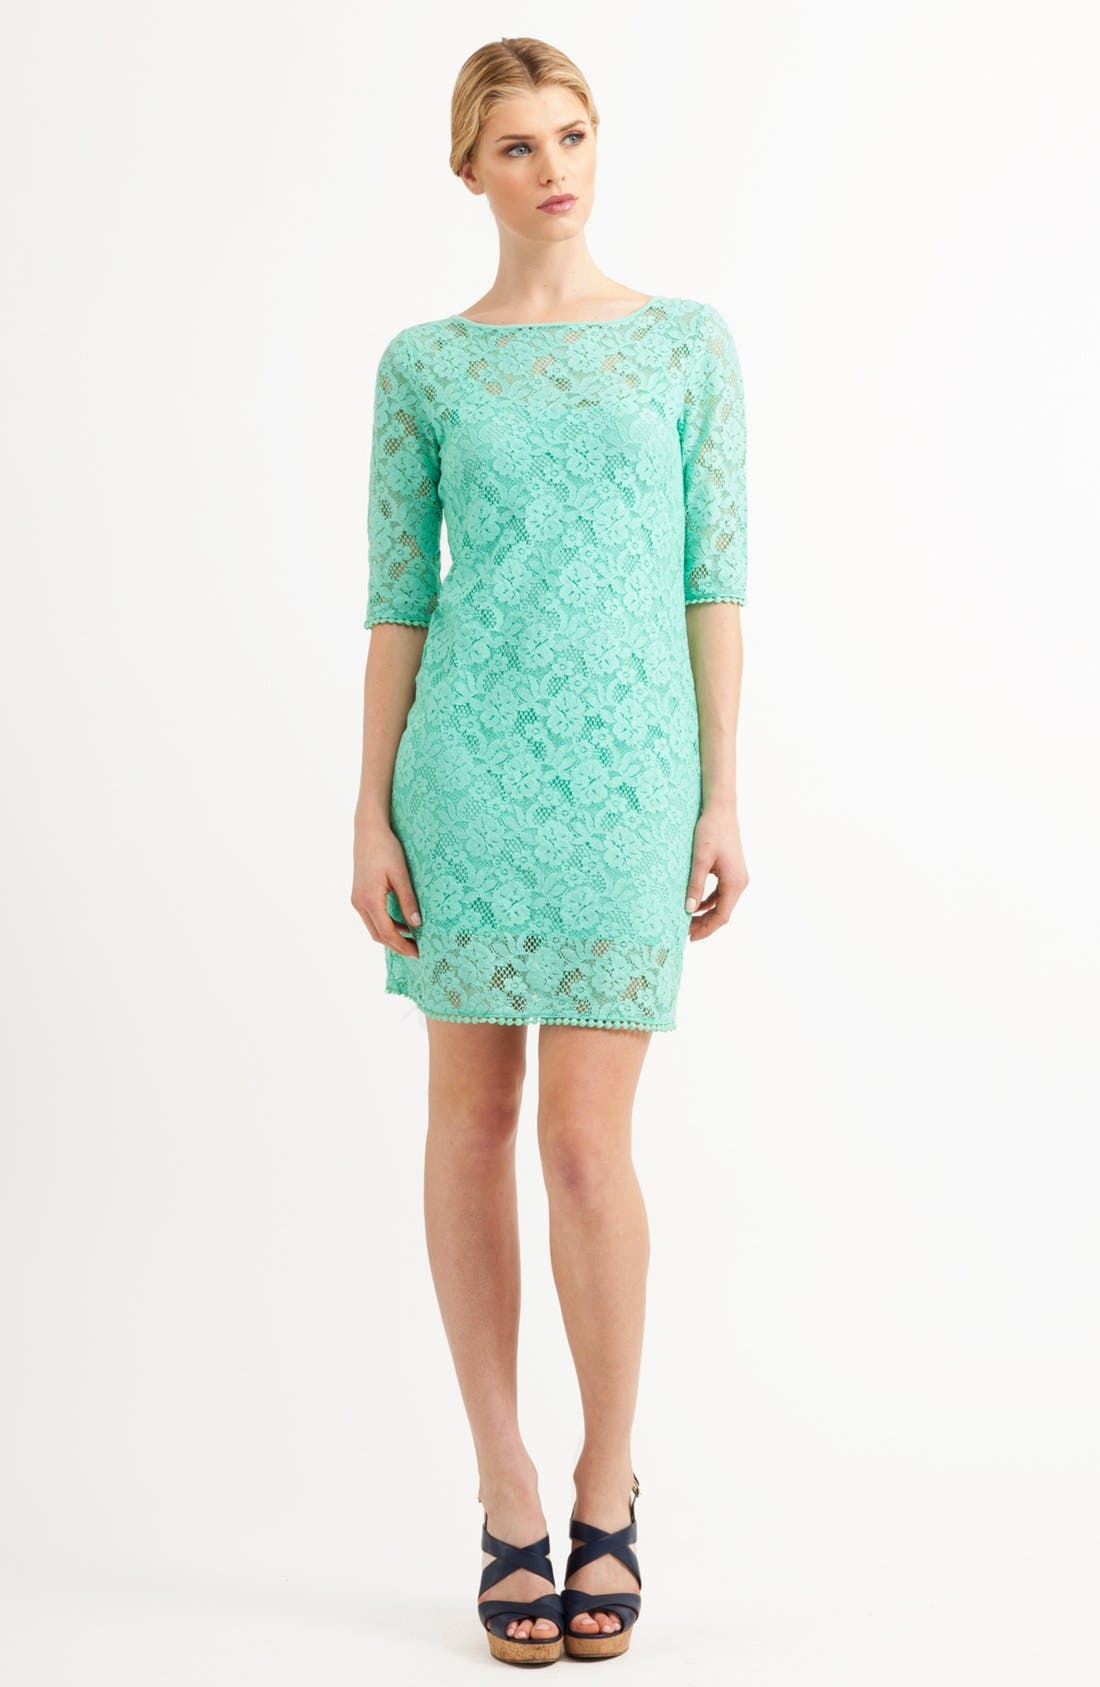 Main Image - Three Dots Lace Shift Dress